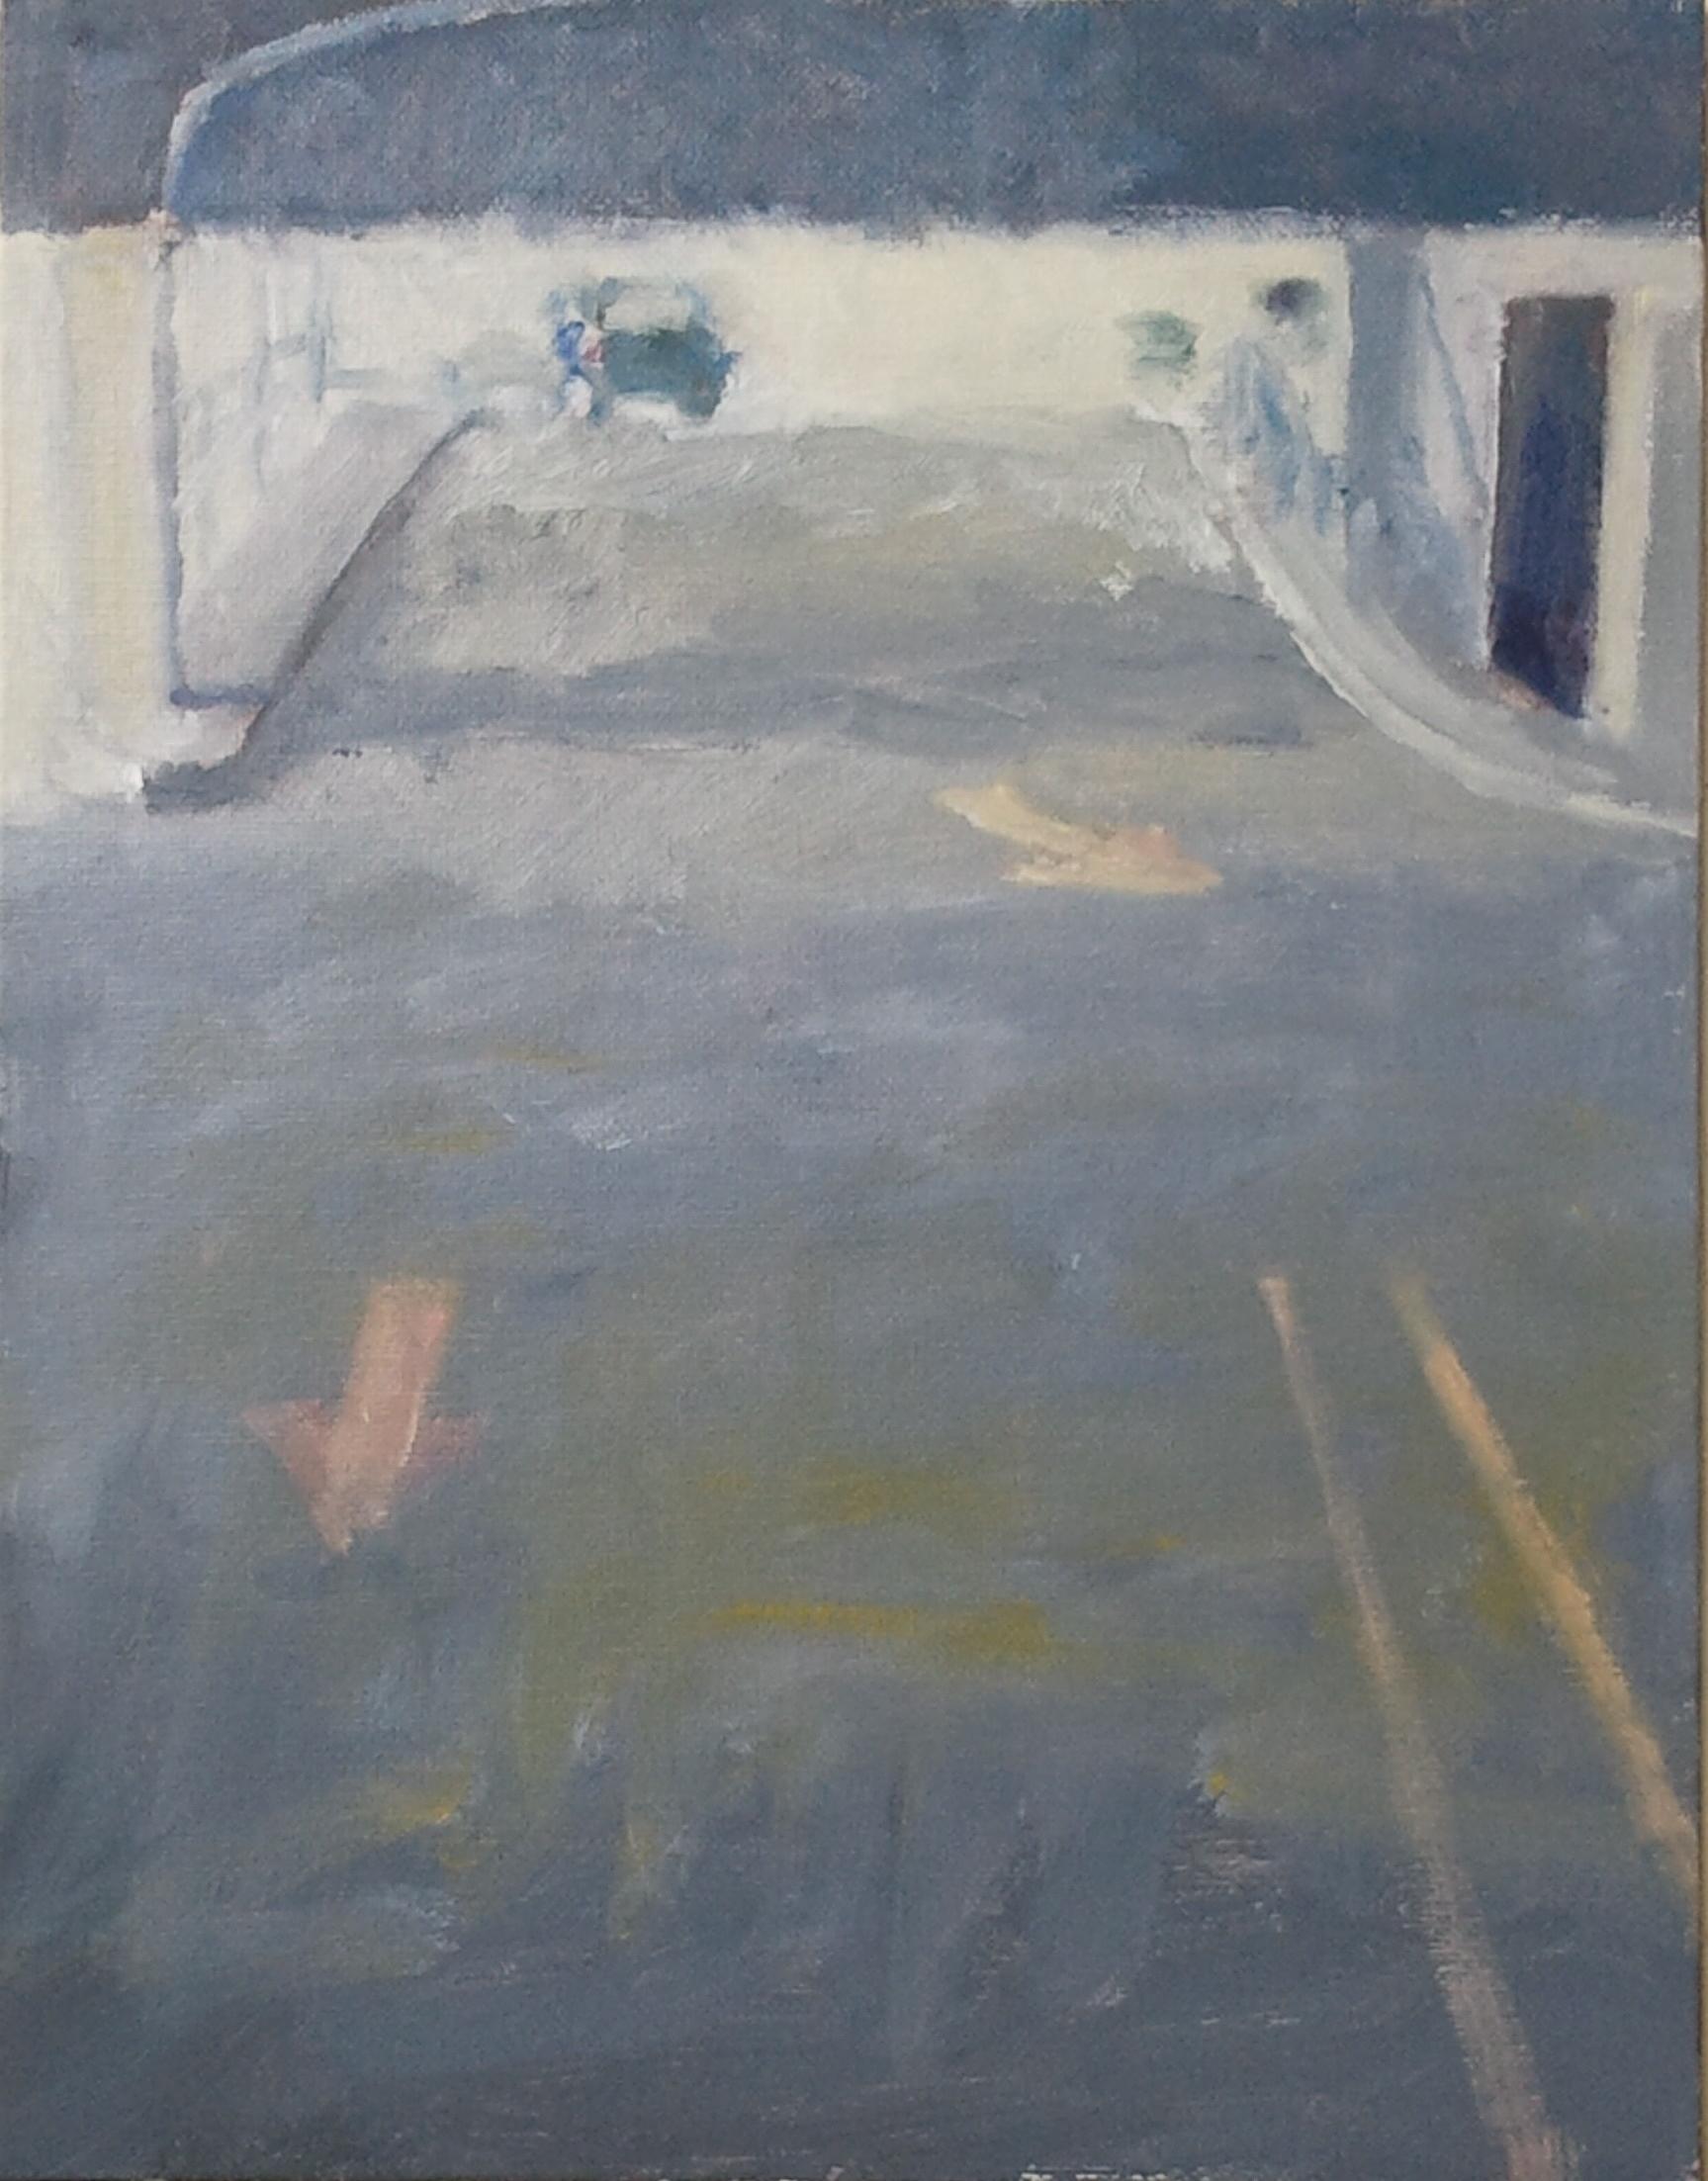 """Parking Arrows,"" 11""x14"", oil on canvas."